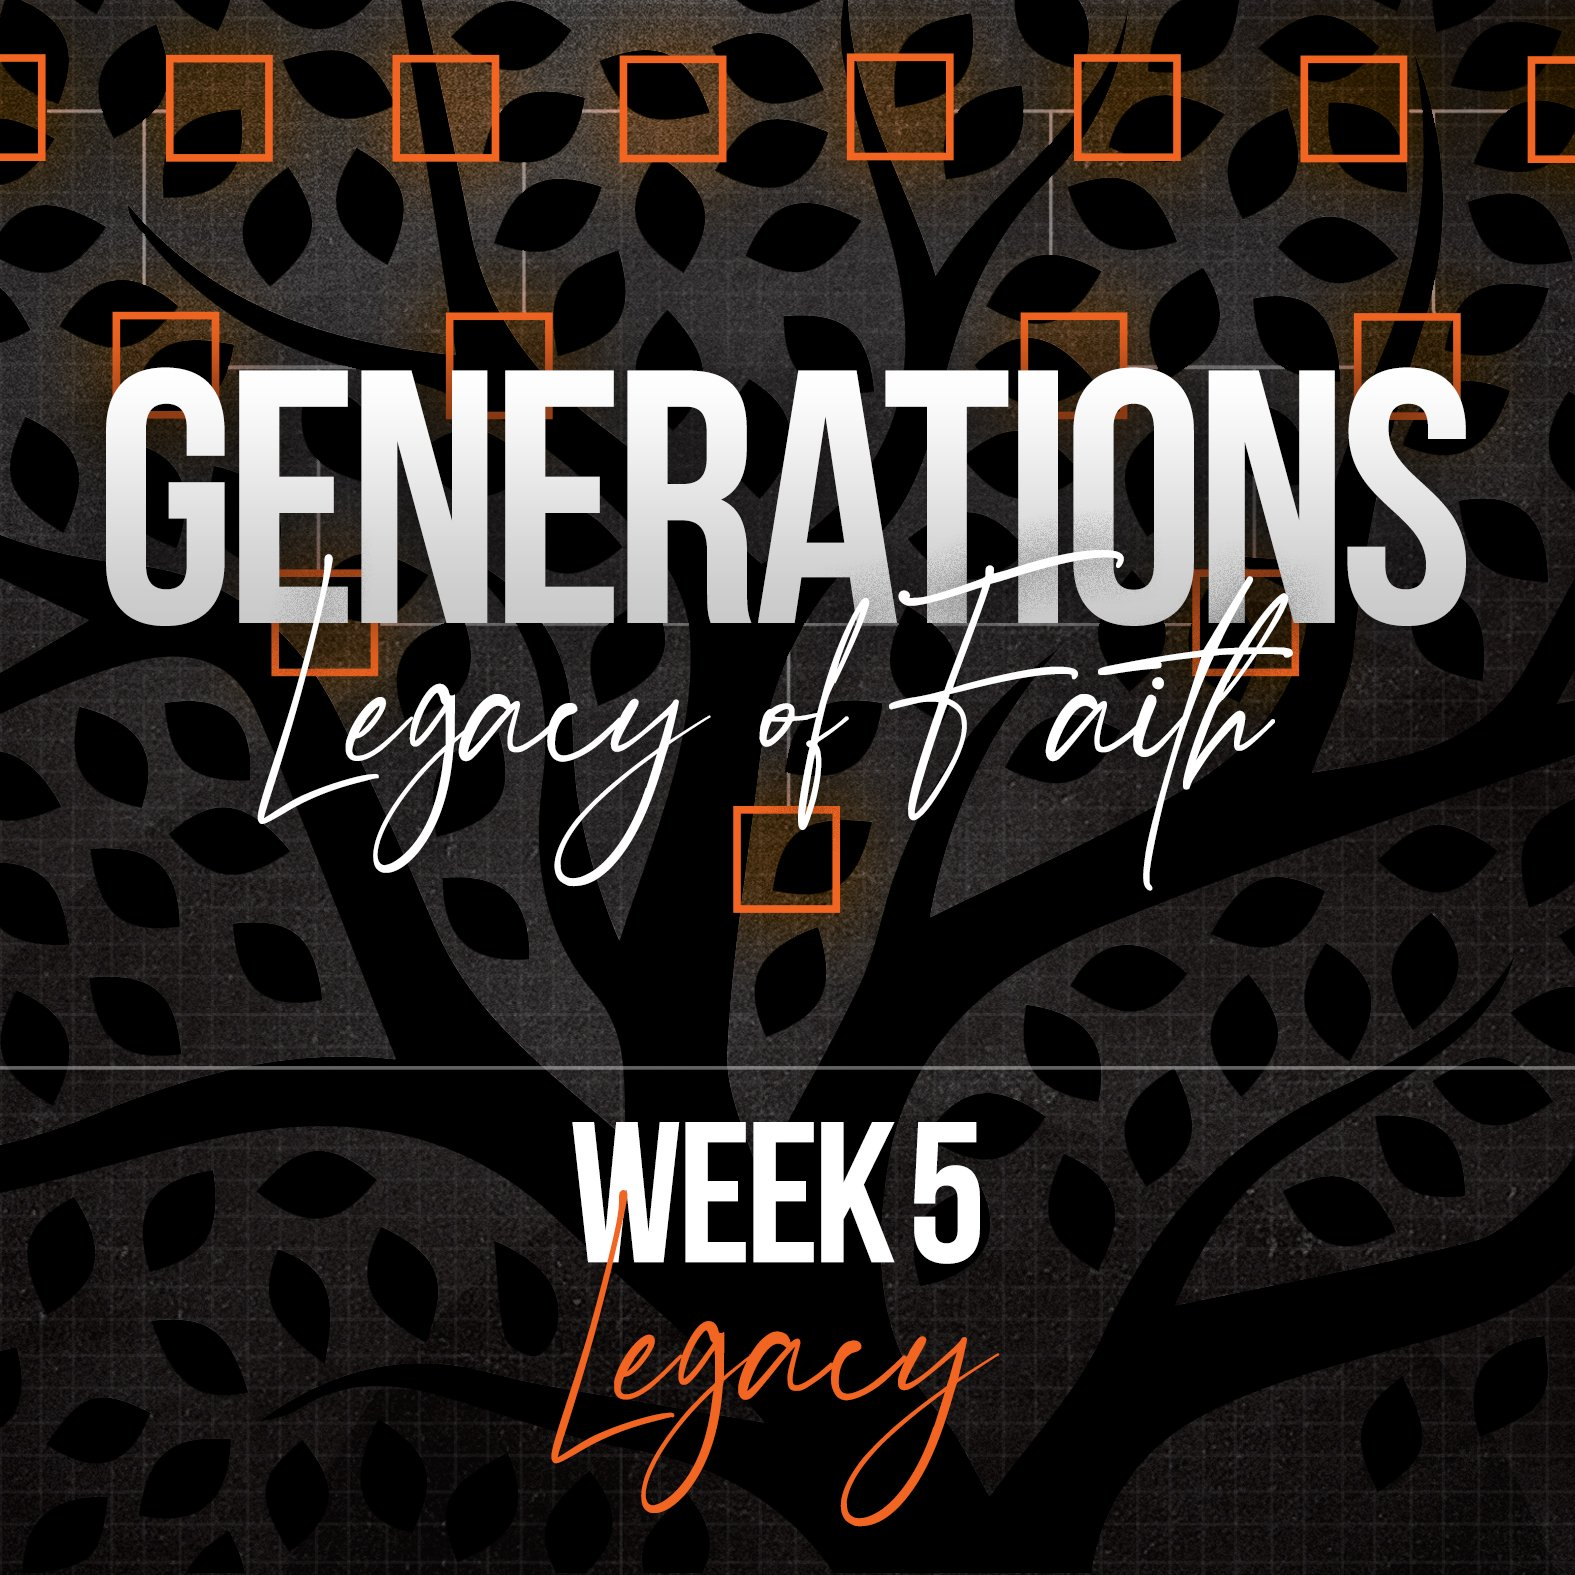 Generations Sermon Web 5